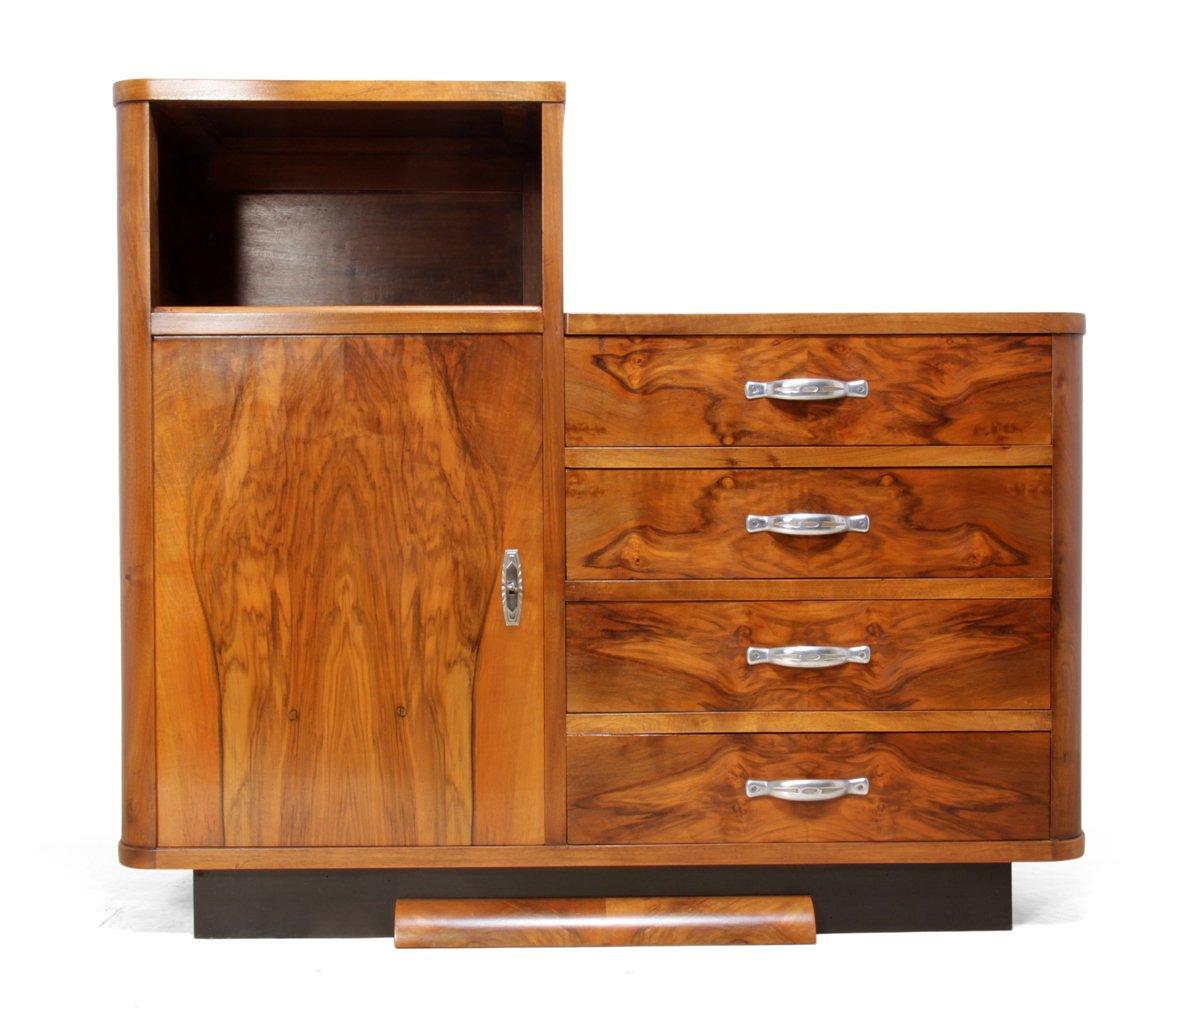 art deco nussholz schrank 1930er bei pamono kaufen. Black Bedroom Furniture Sets. Home Design Ideas